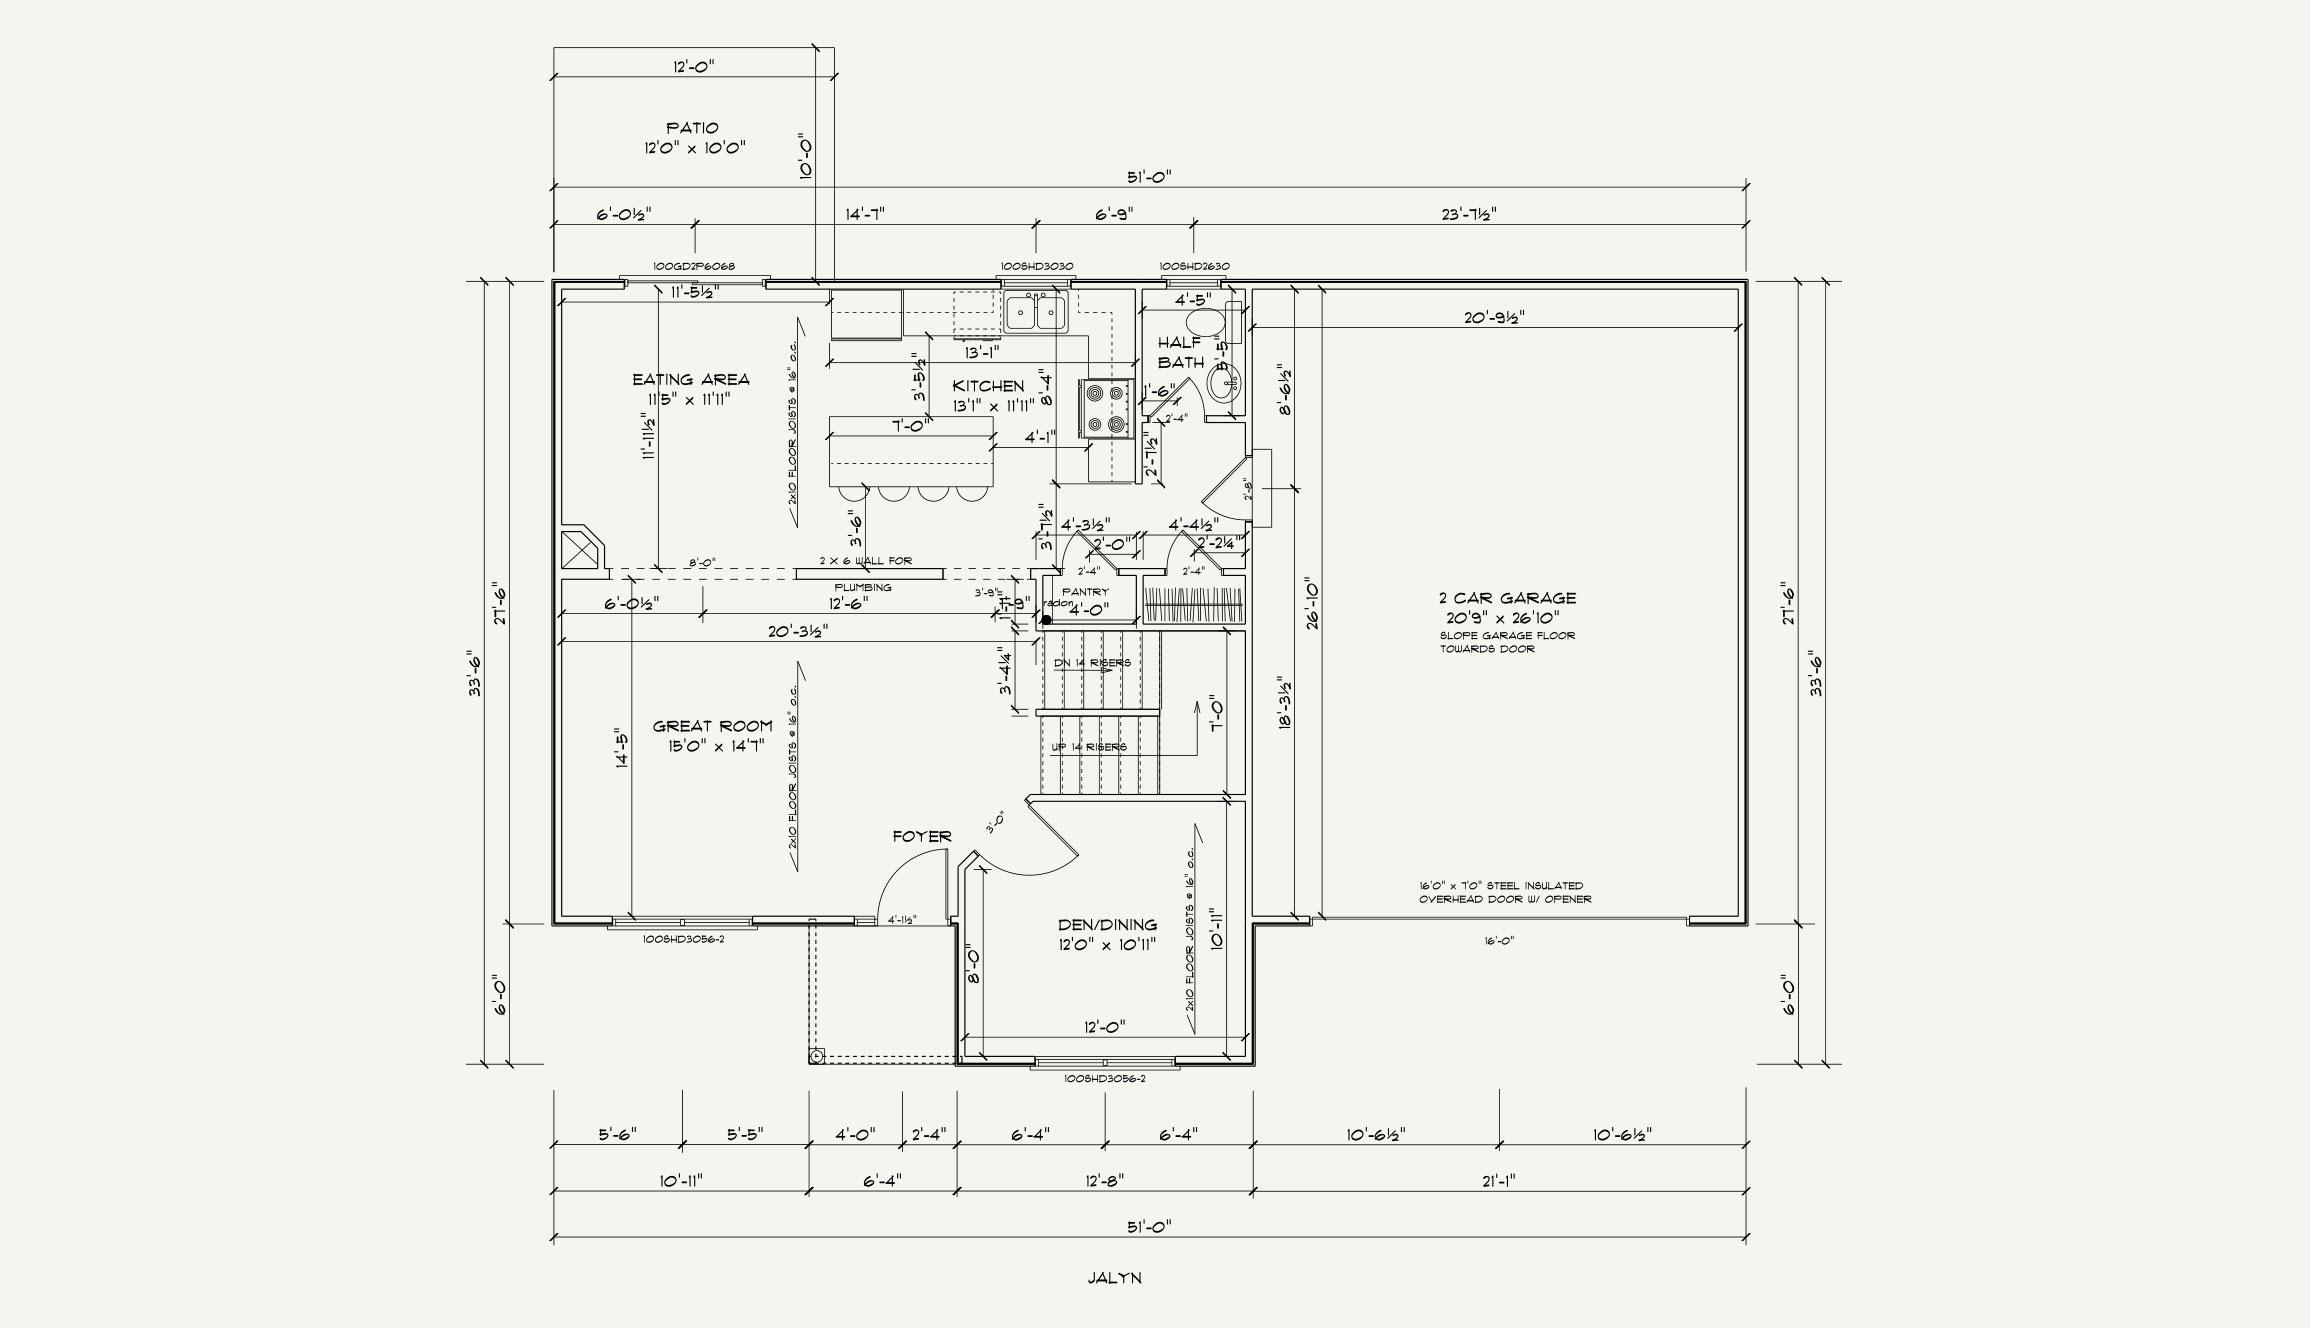 SALewis-Parkside-Jayln-Floorplan.jpg